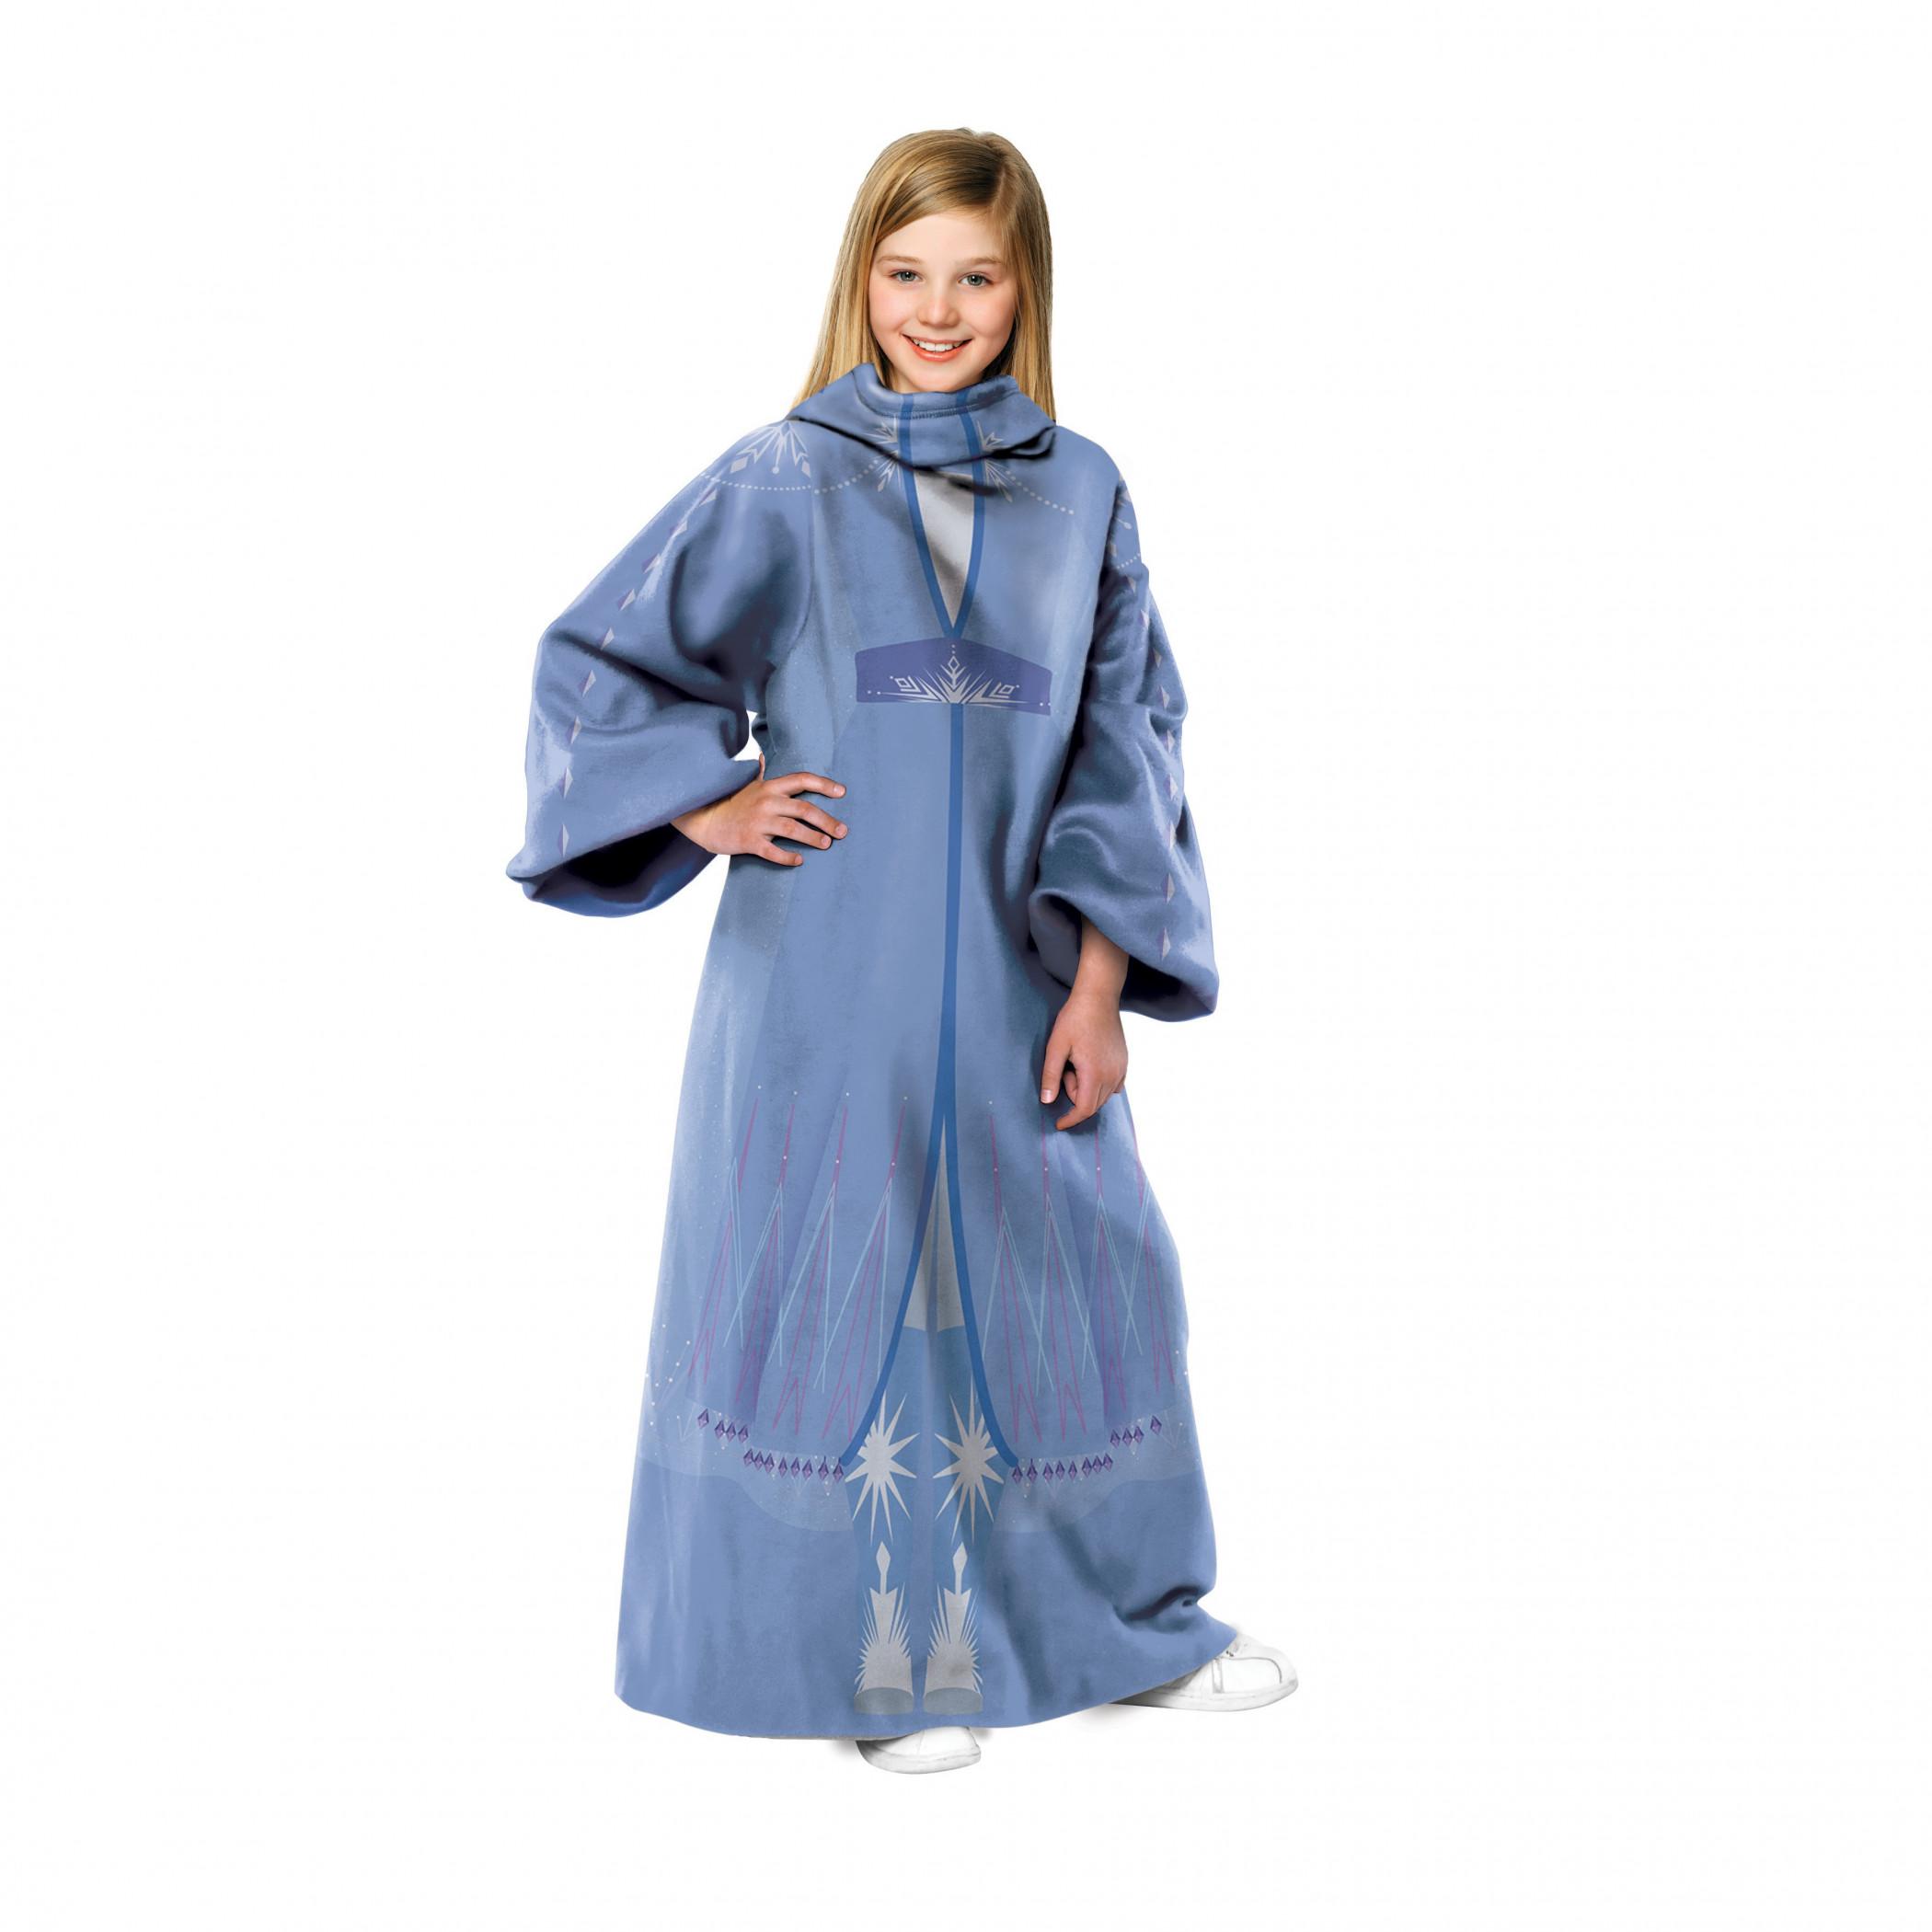 Disney Frozen Elsa Youth Comfy Throw Blanket